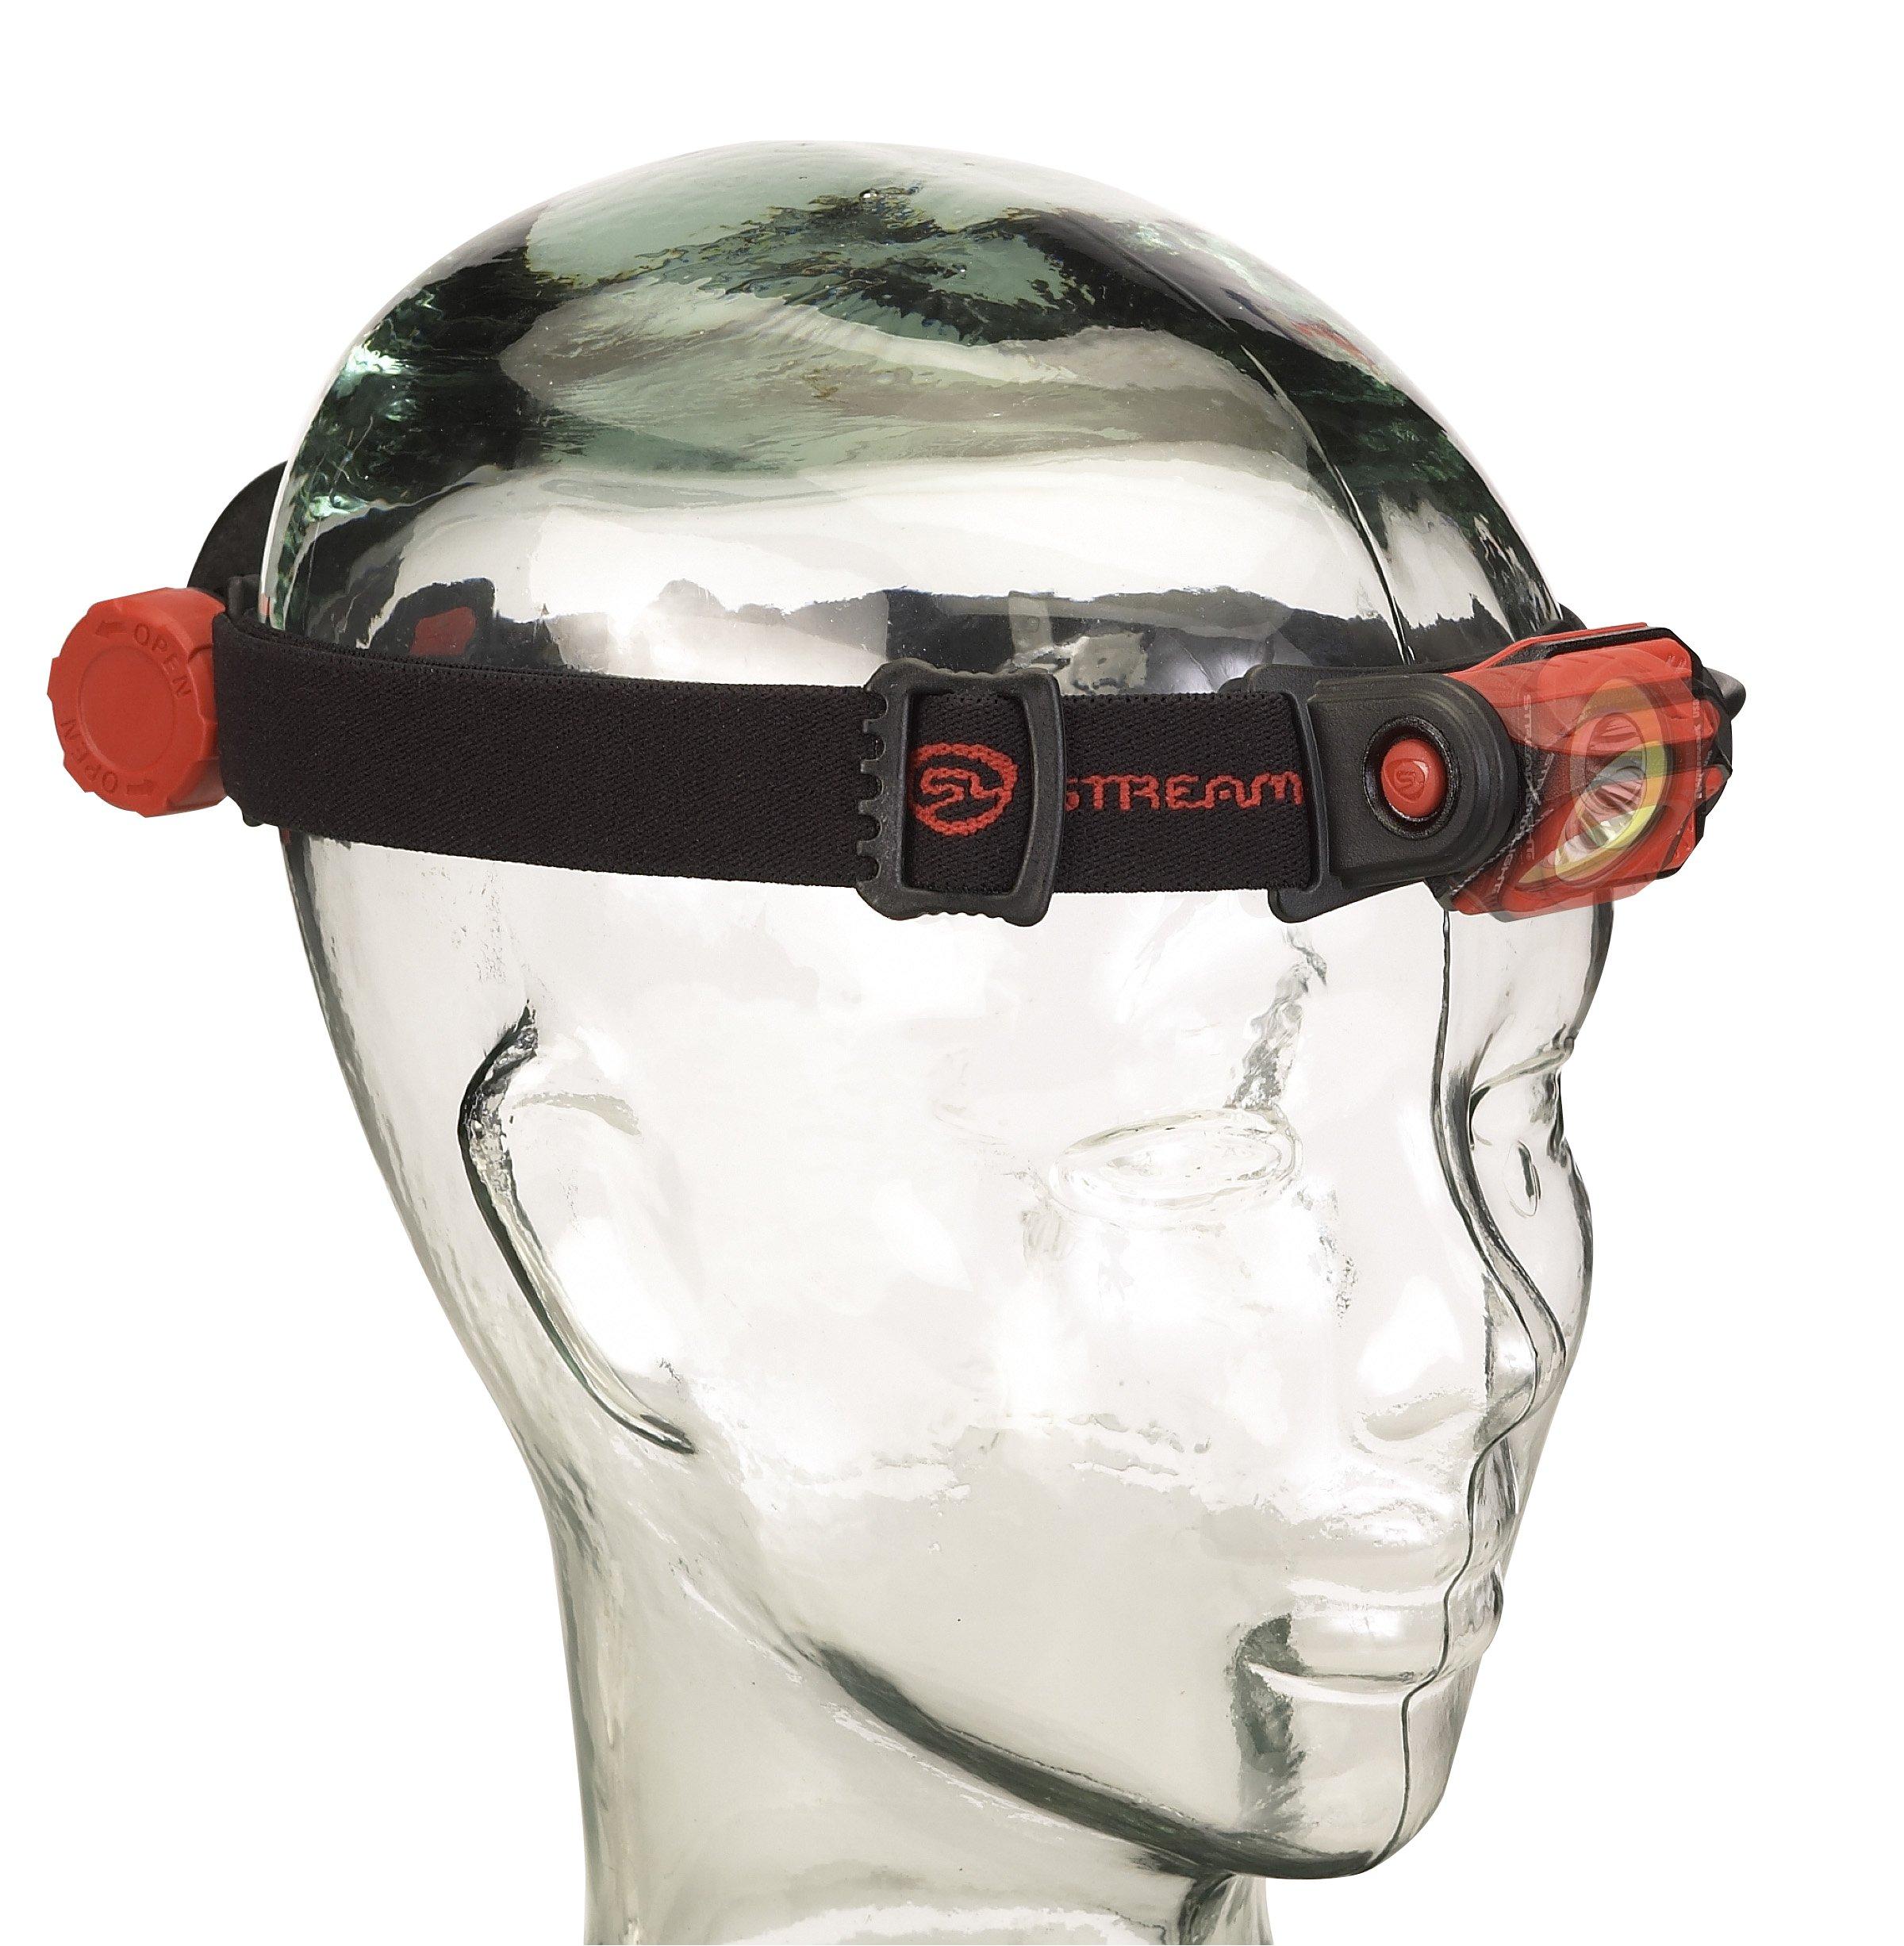 Streamlight 51064 Twin-Task USB Headlamp, Black/Red, Boxed - 375 Lumens